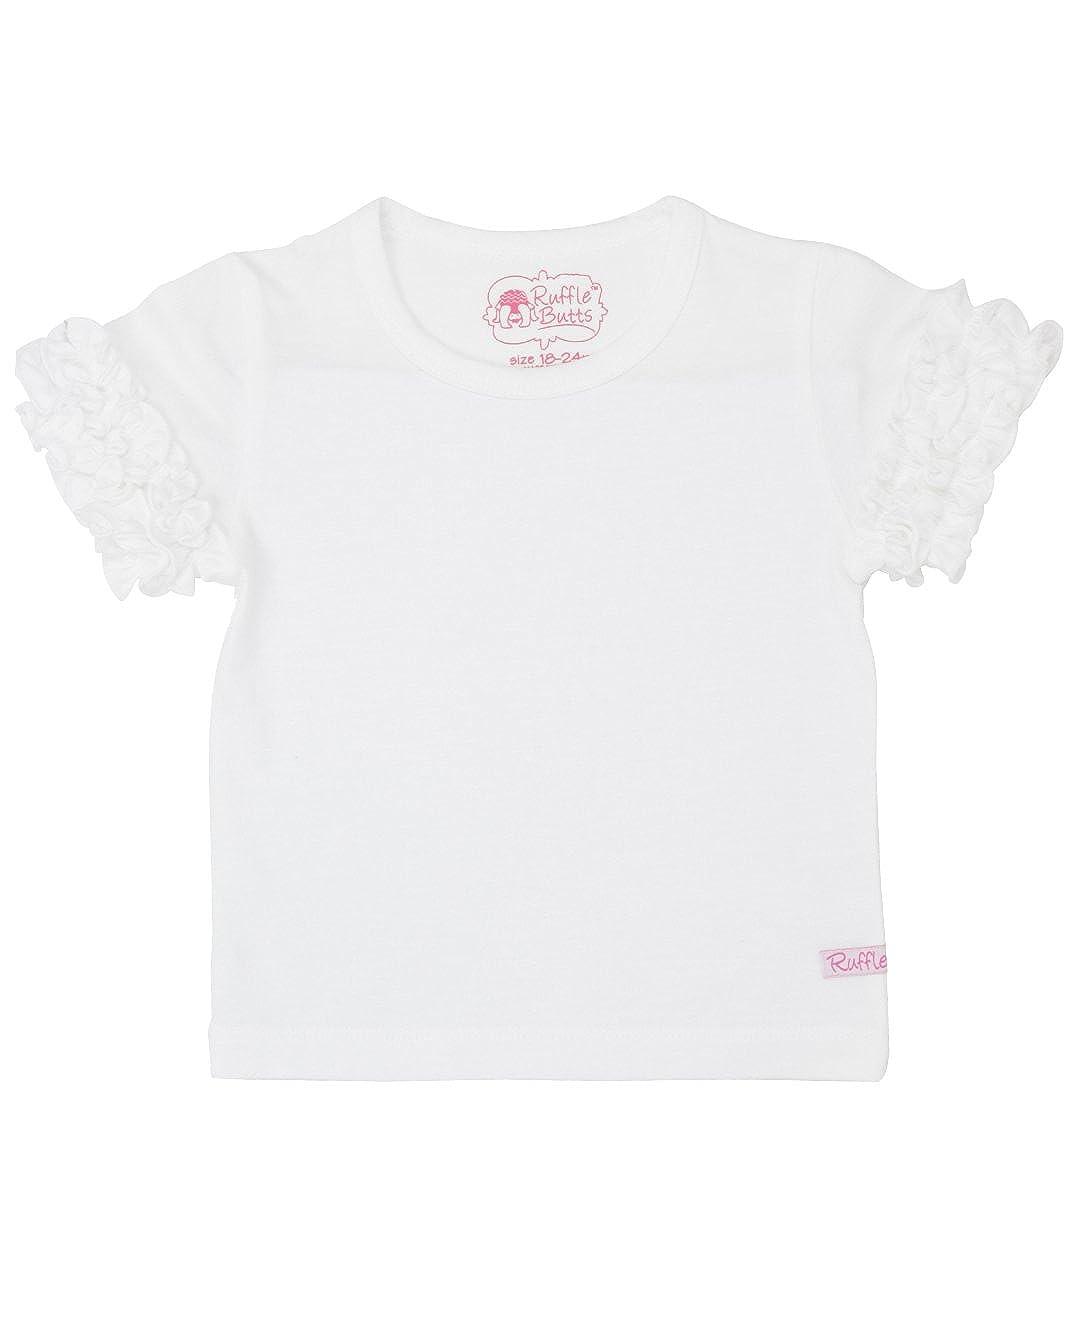 RuffleButts Baby/Toddler Girls Ruffled Short Sleeve Undershirt SSMYYXX-UNDR-SC-BABY